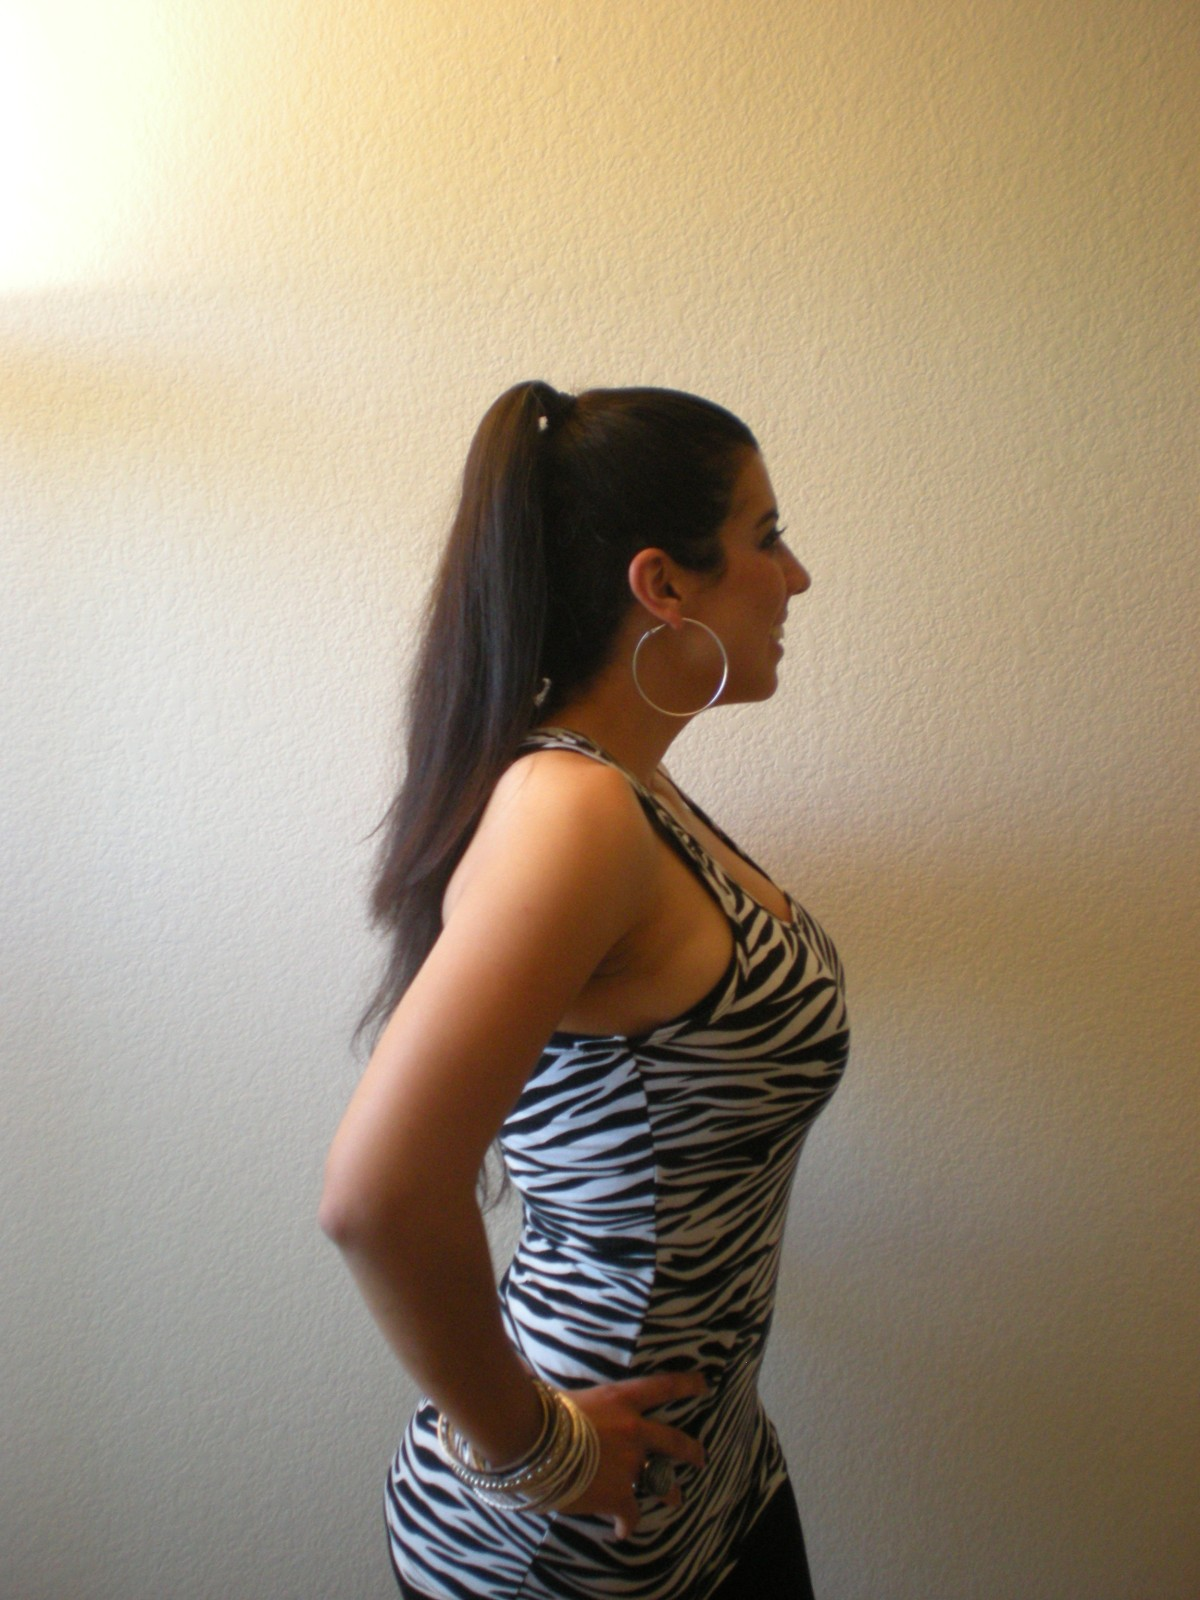 LittlestMartha's Zebra hair for the Safari pub crawl